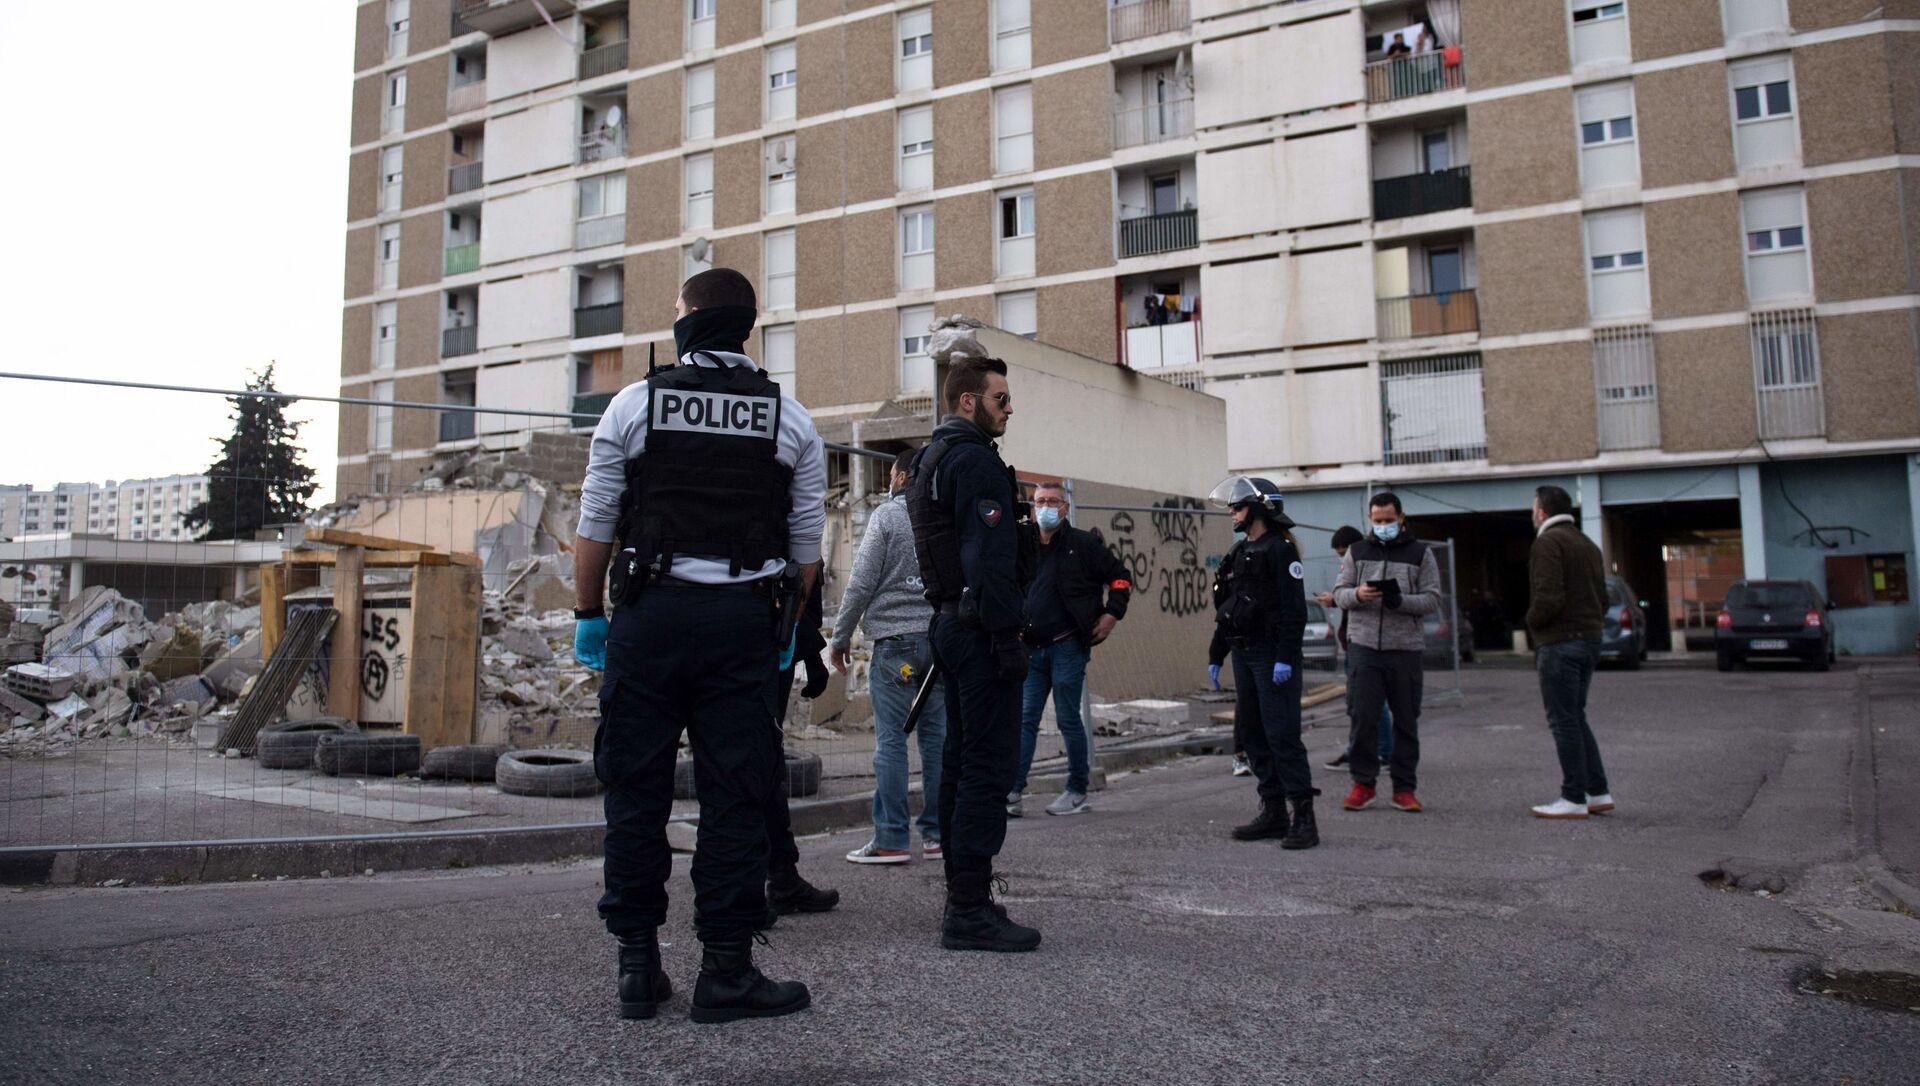 police à Marseille - Sputnik France, 1920, 19.08.2021